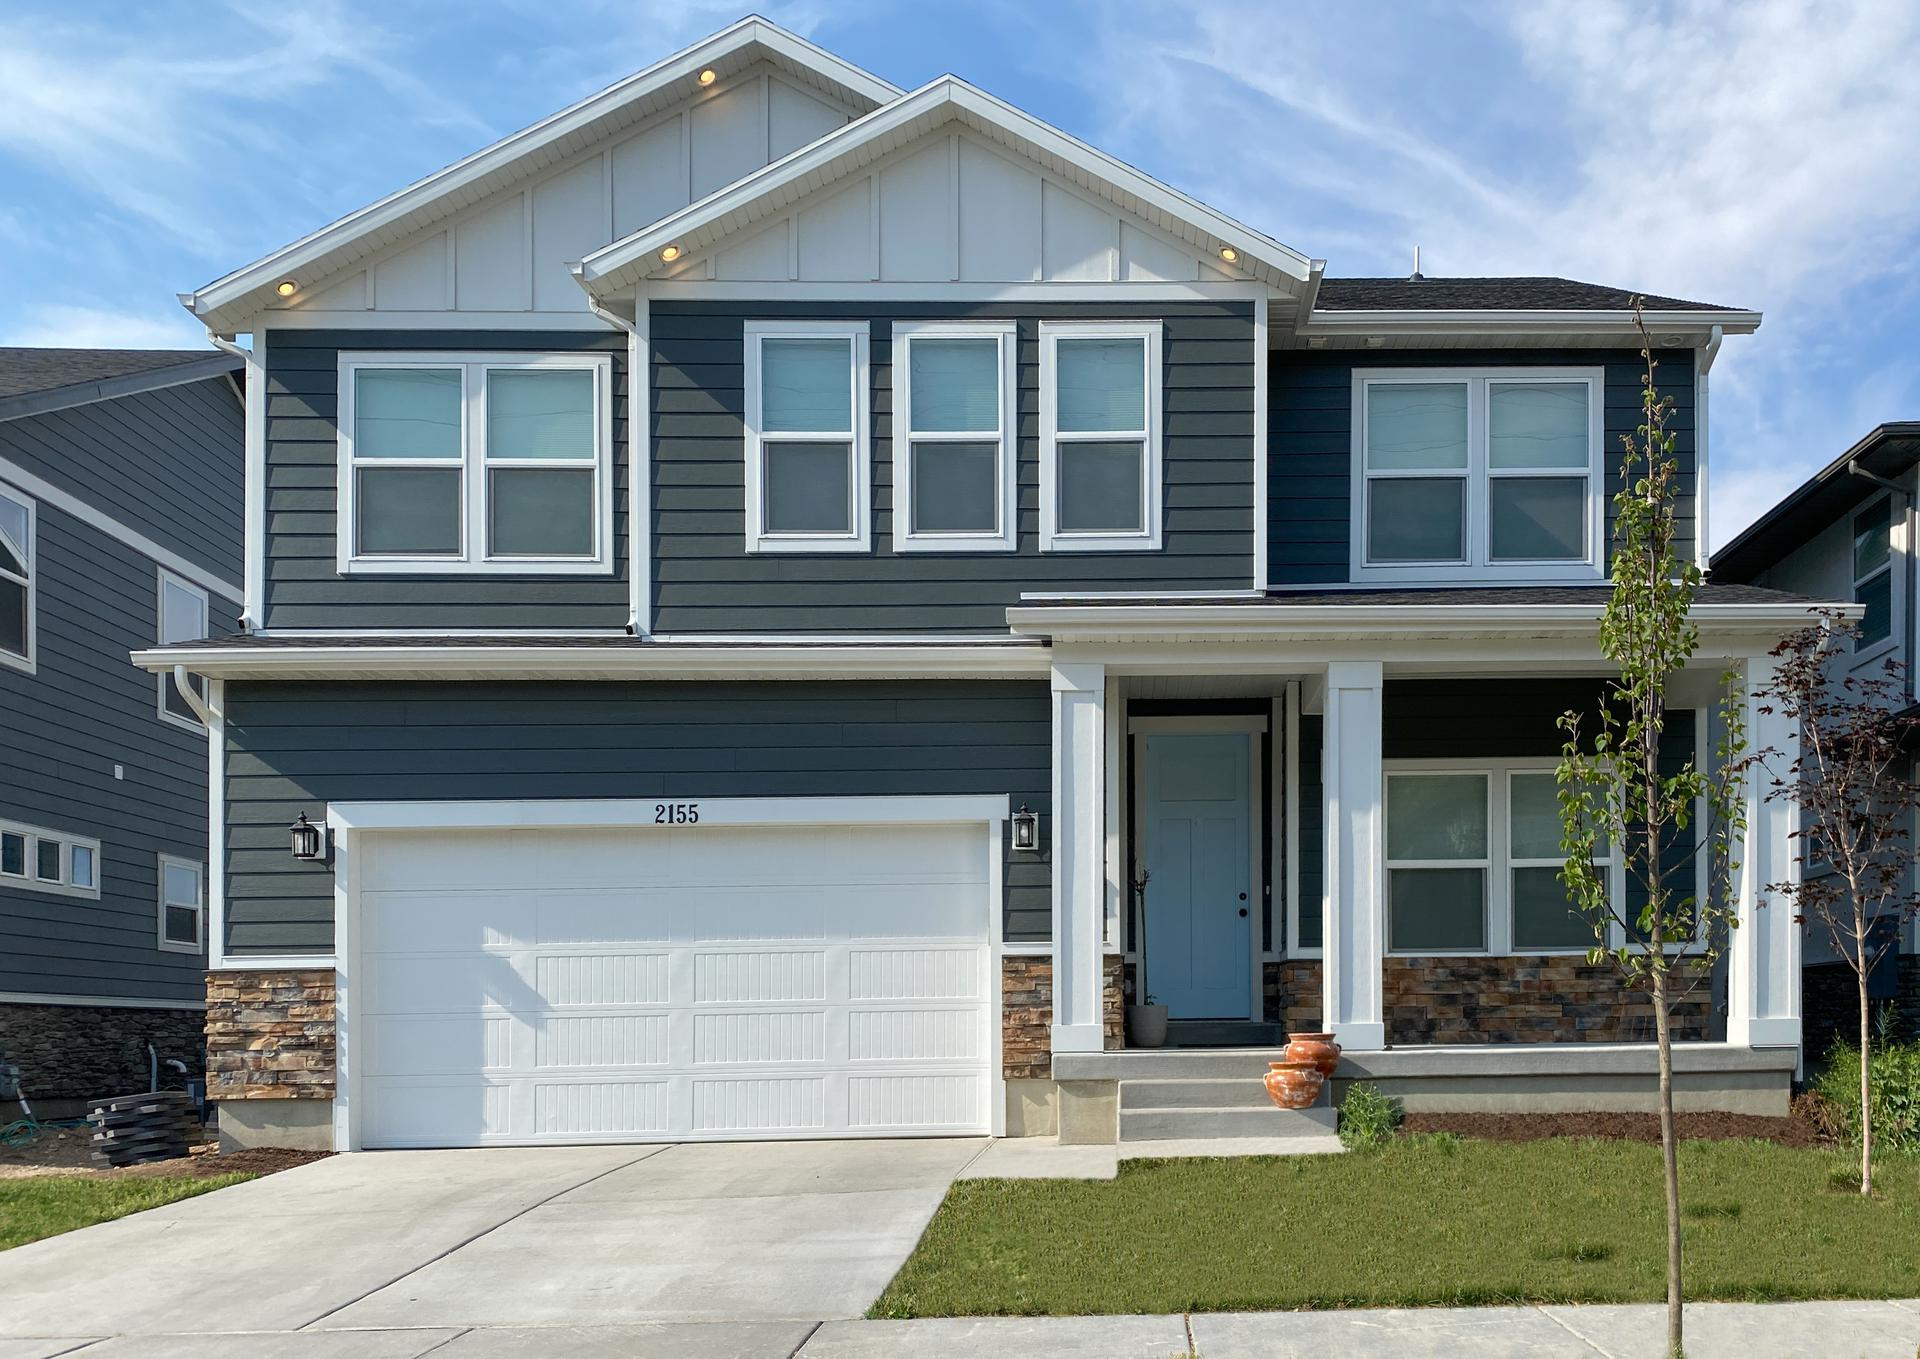 New Home for sale 4358 E Inverness Ln #102, Eagle Mountain, UT